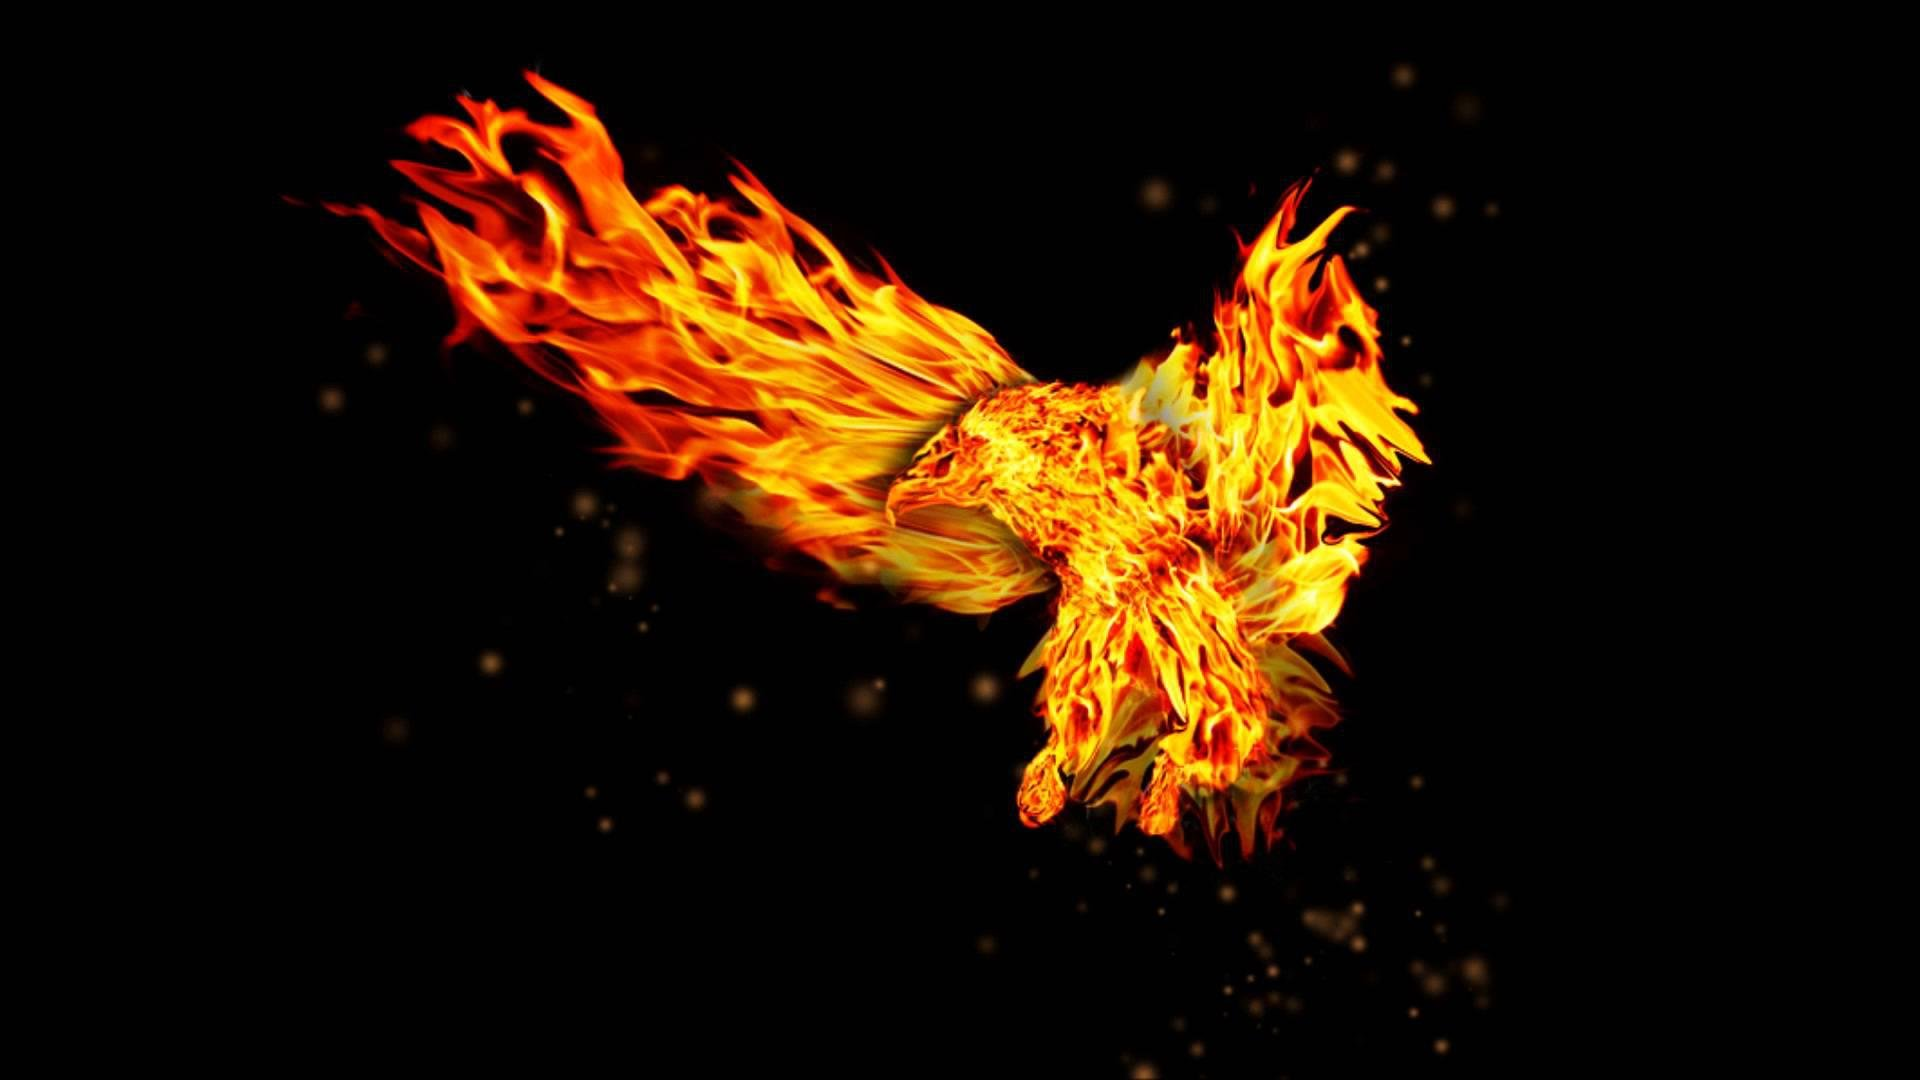 Burning Horse Wallpaper Download